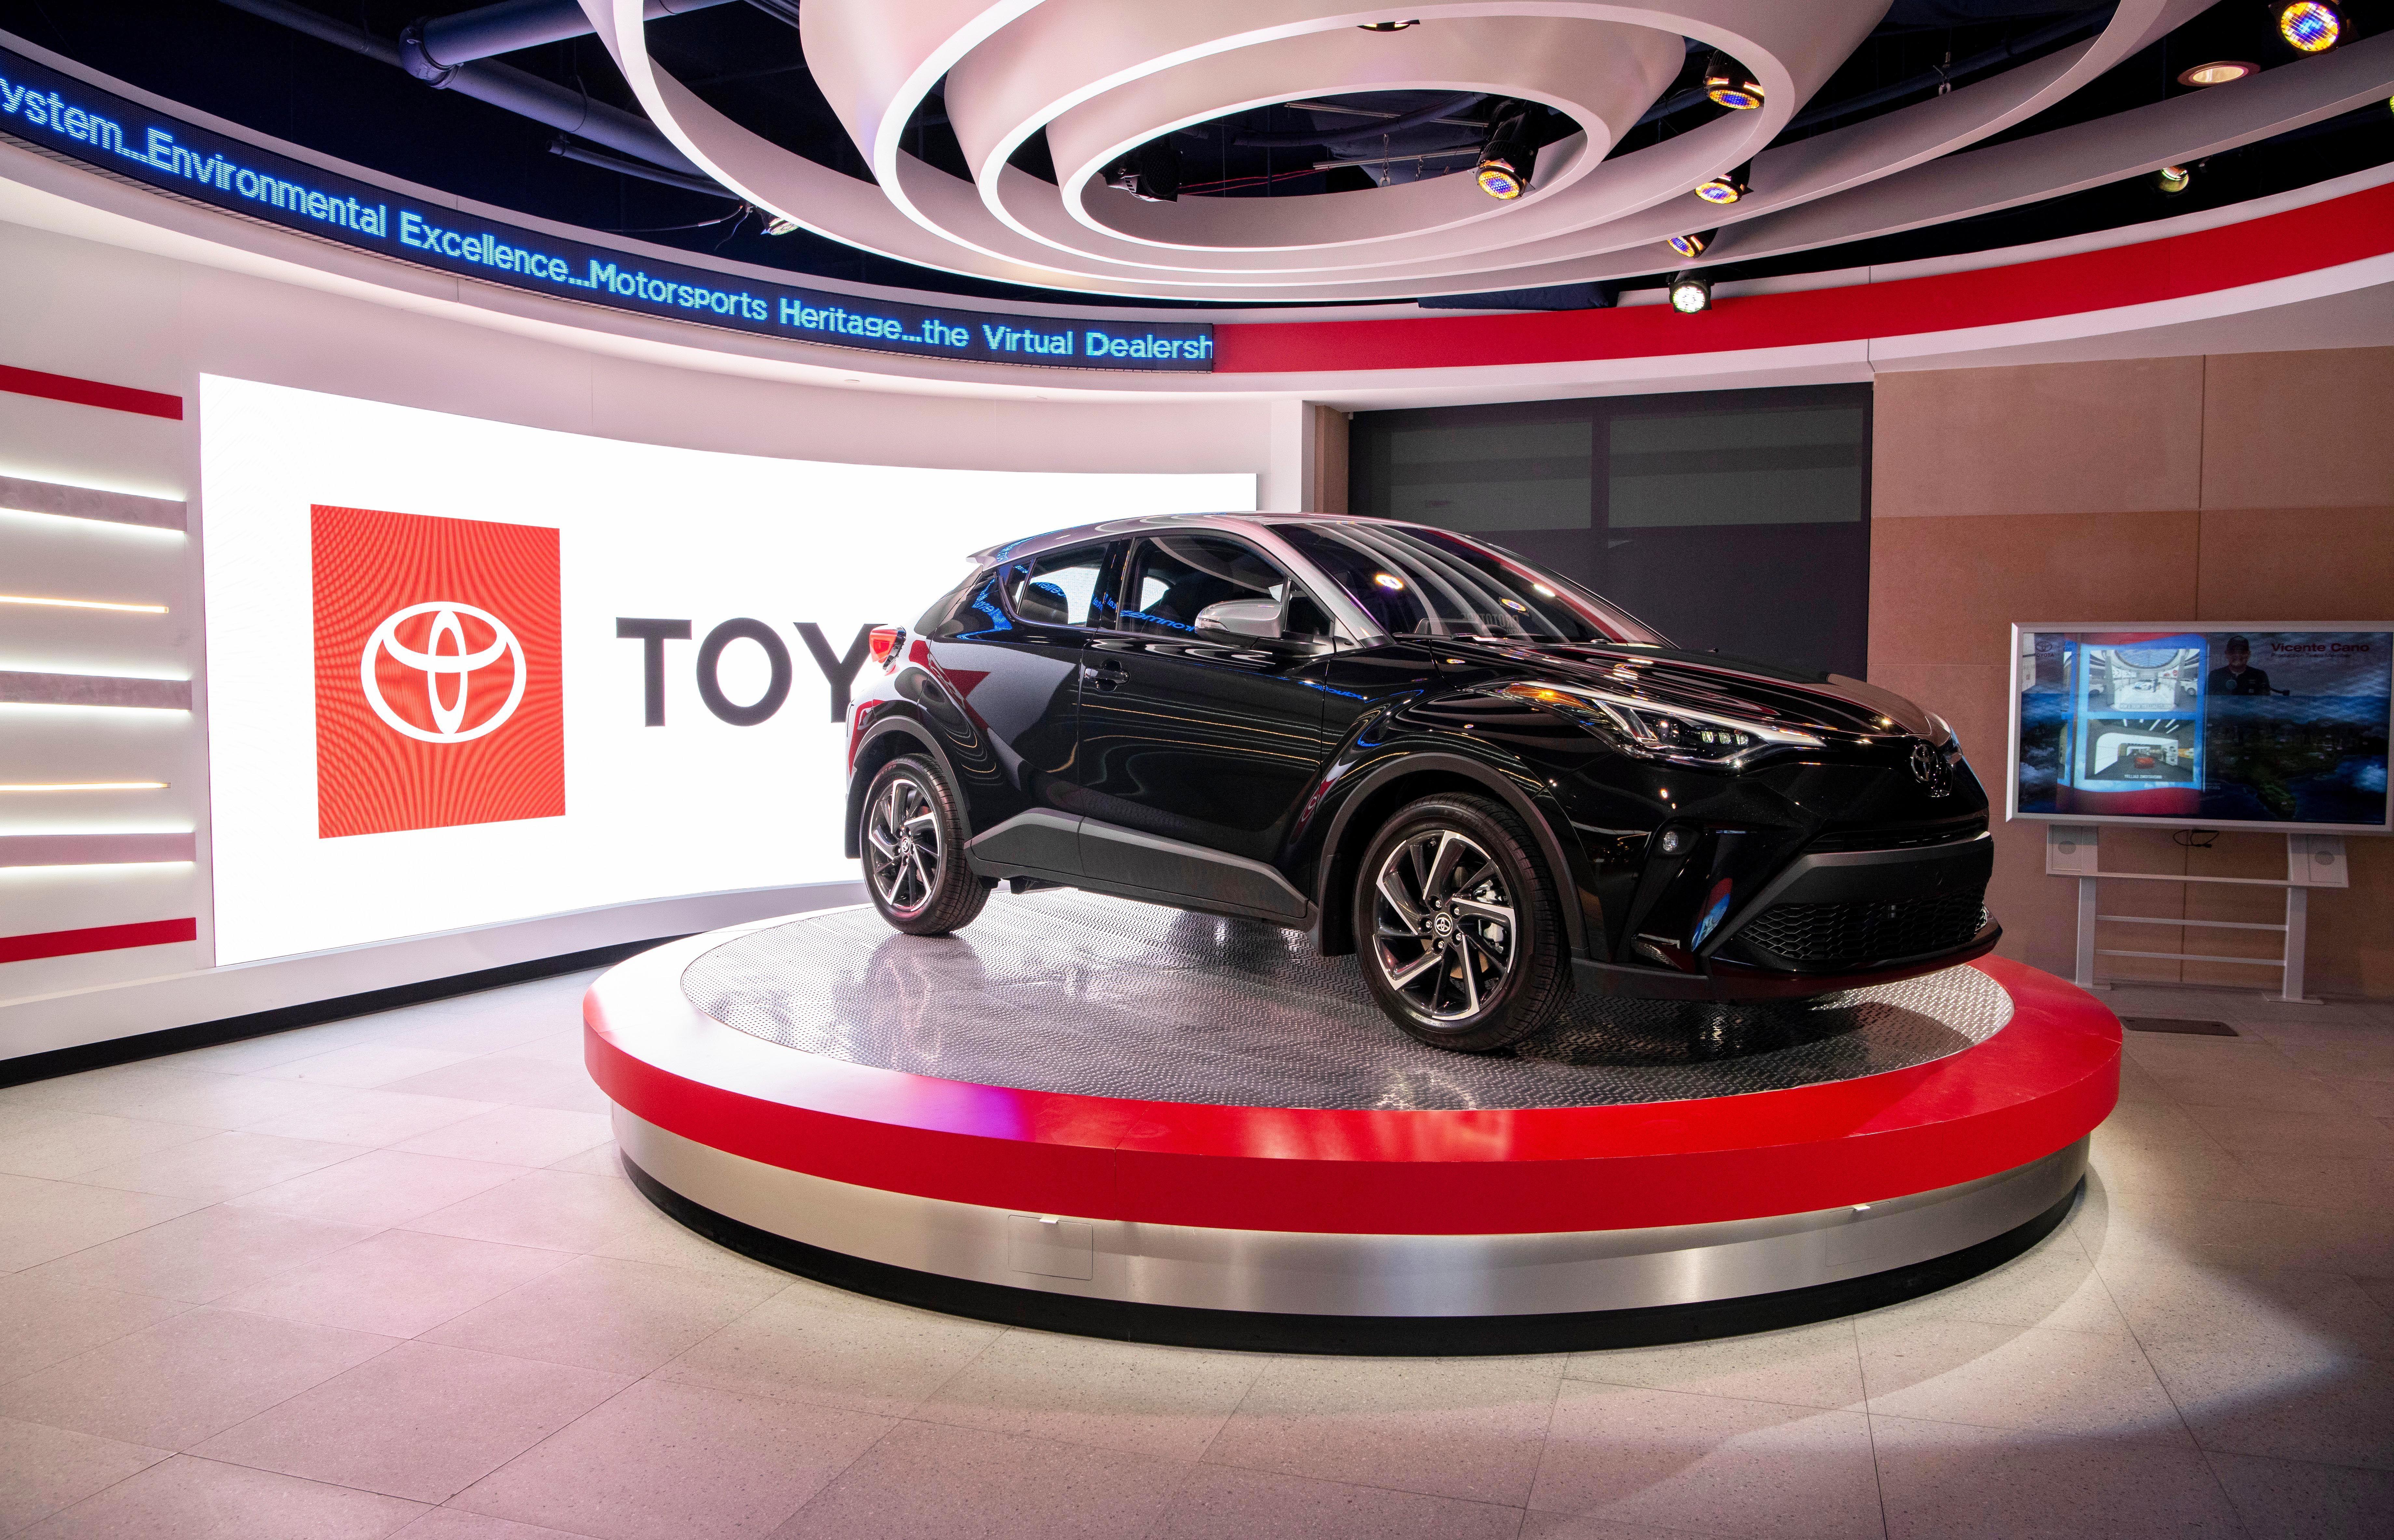 2020 Toyota C Hr Gets A Little Less Weird Looking Toyota C Hr Toyota Apple Car Play